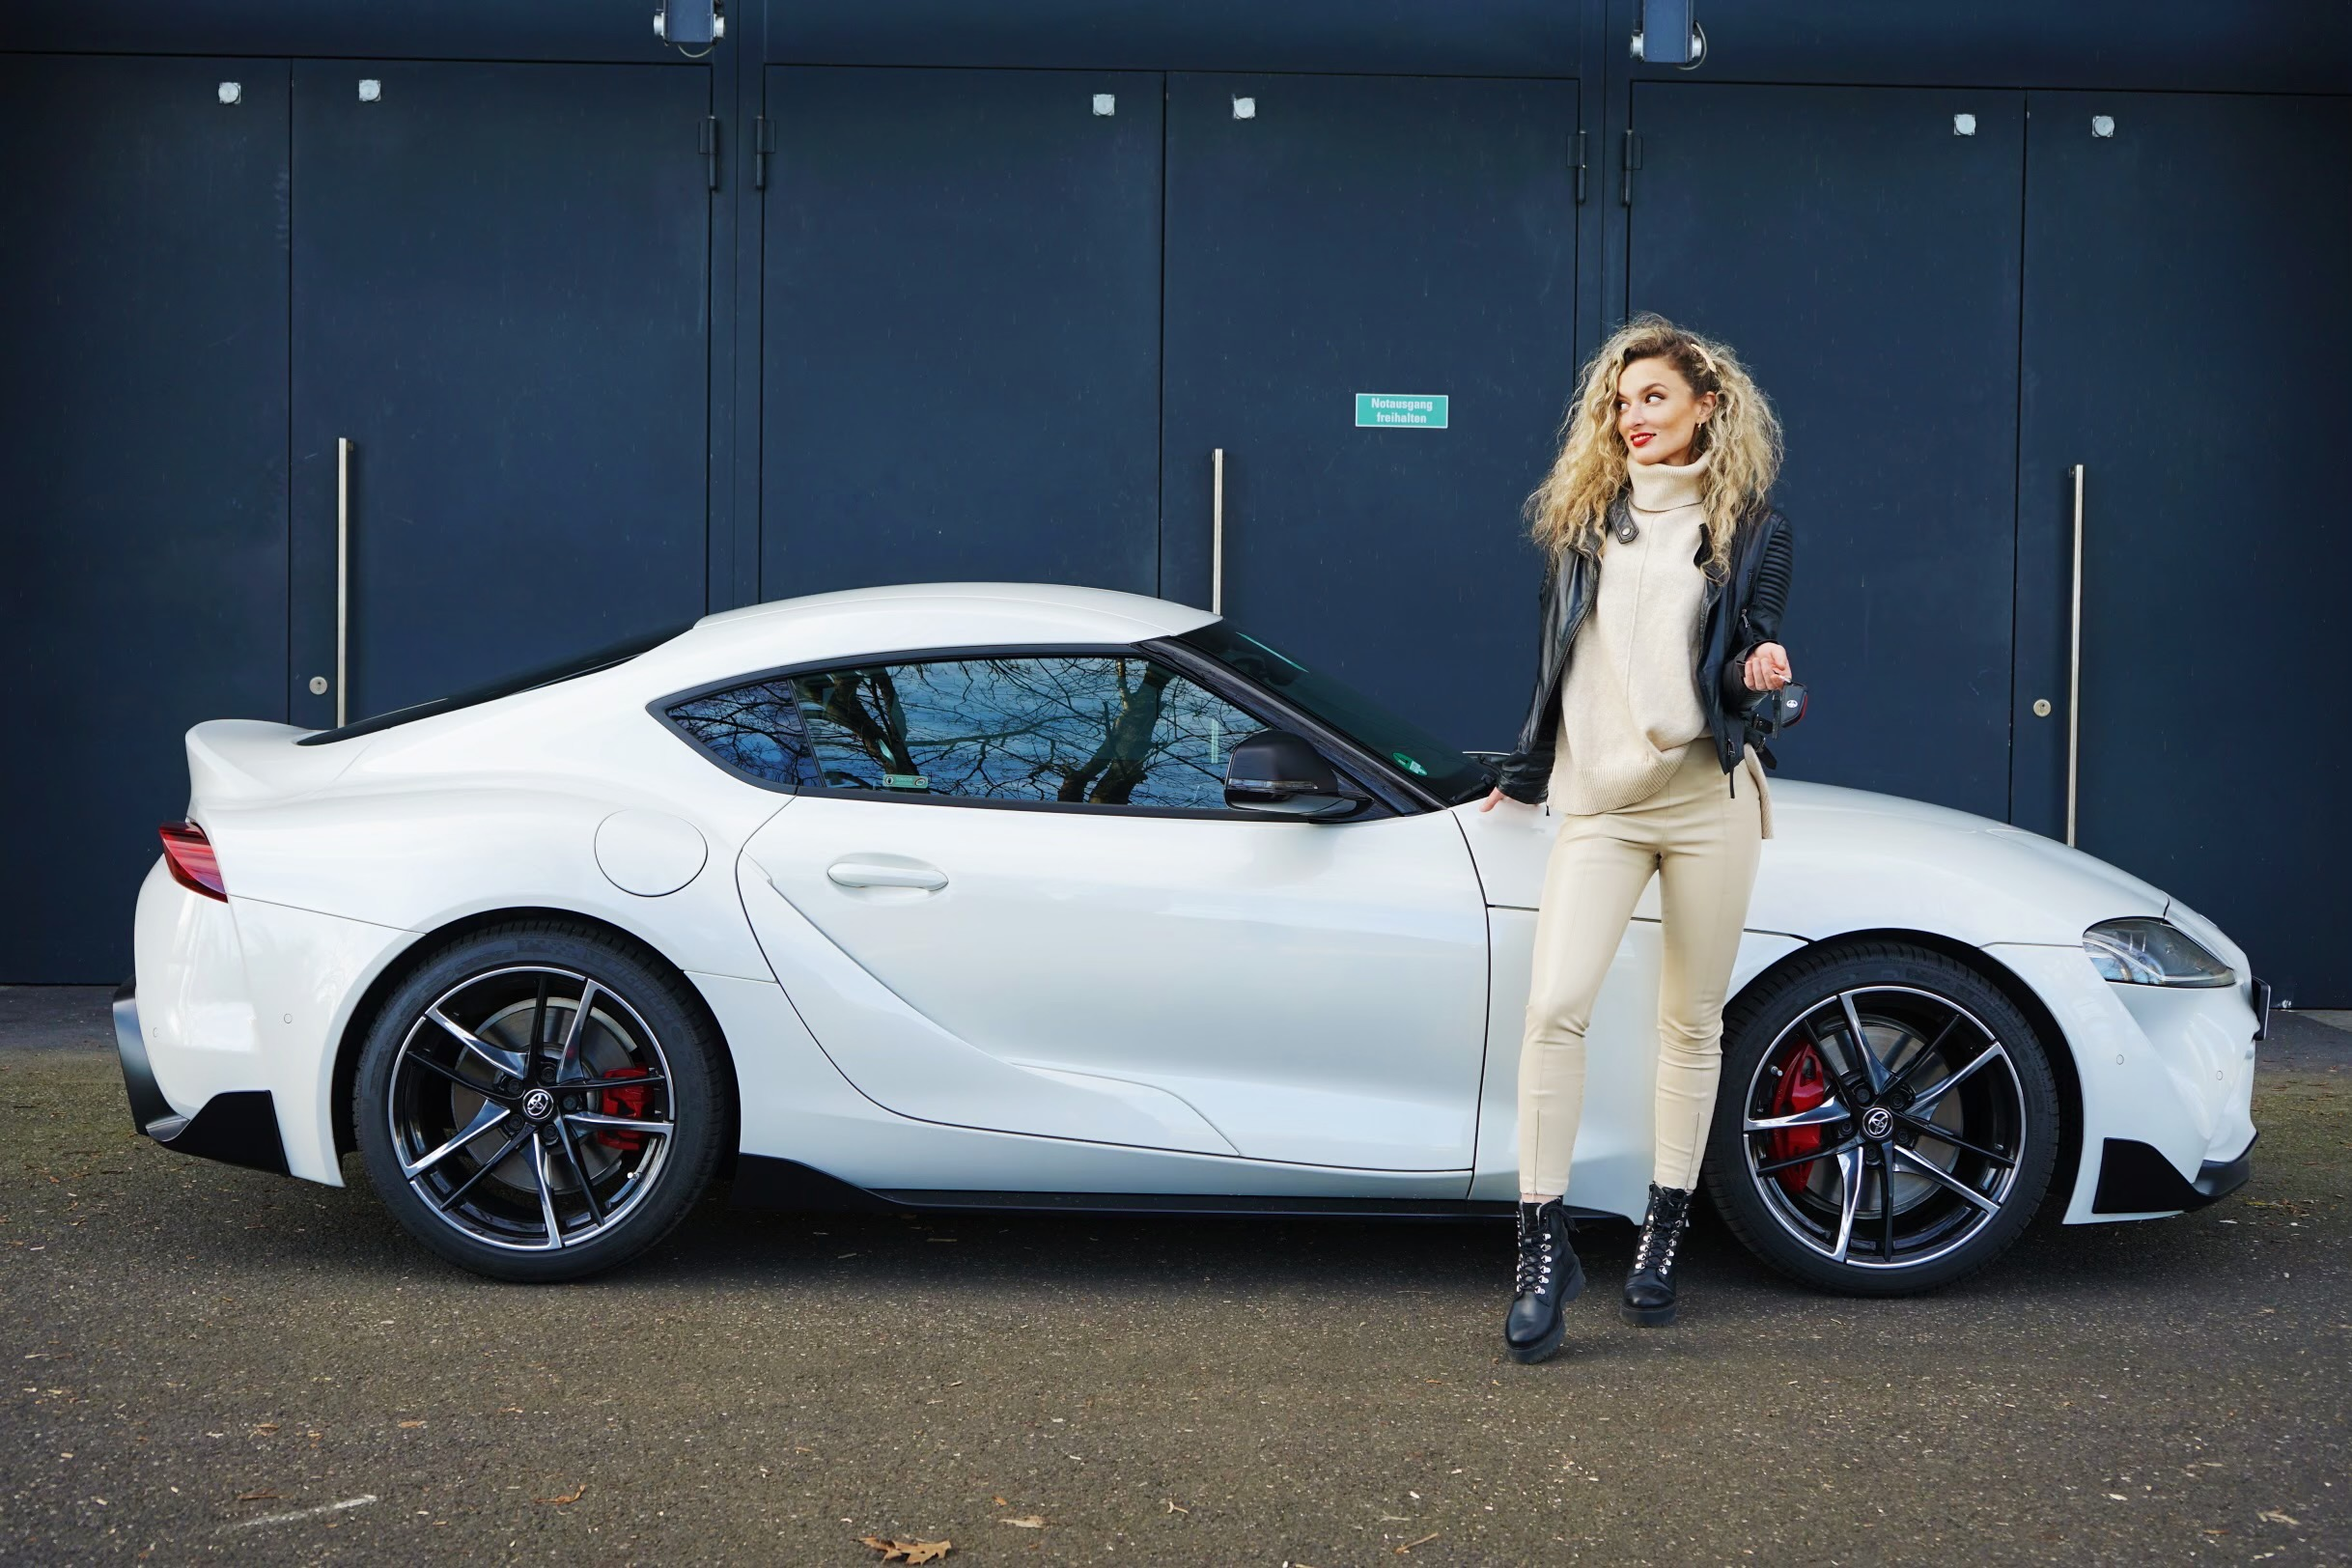 Toyota Supra GR Coupe – Underground?